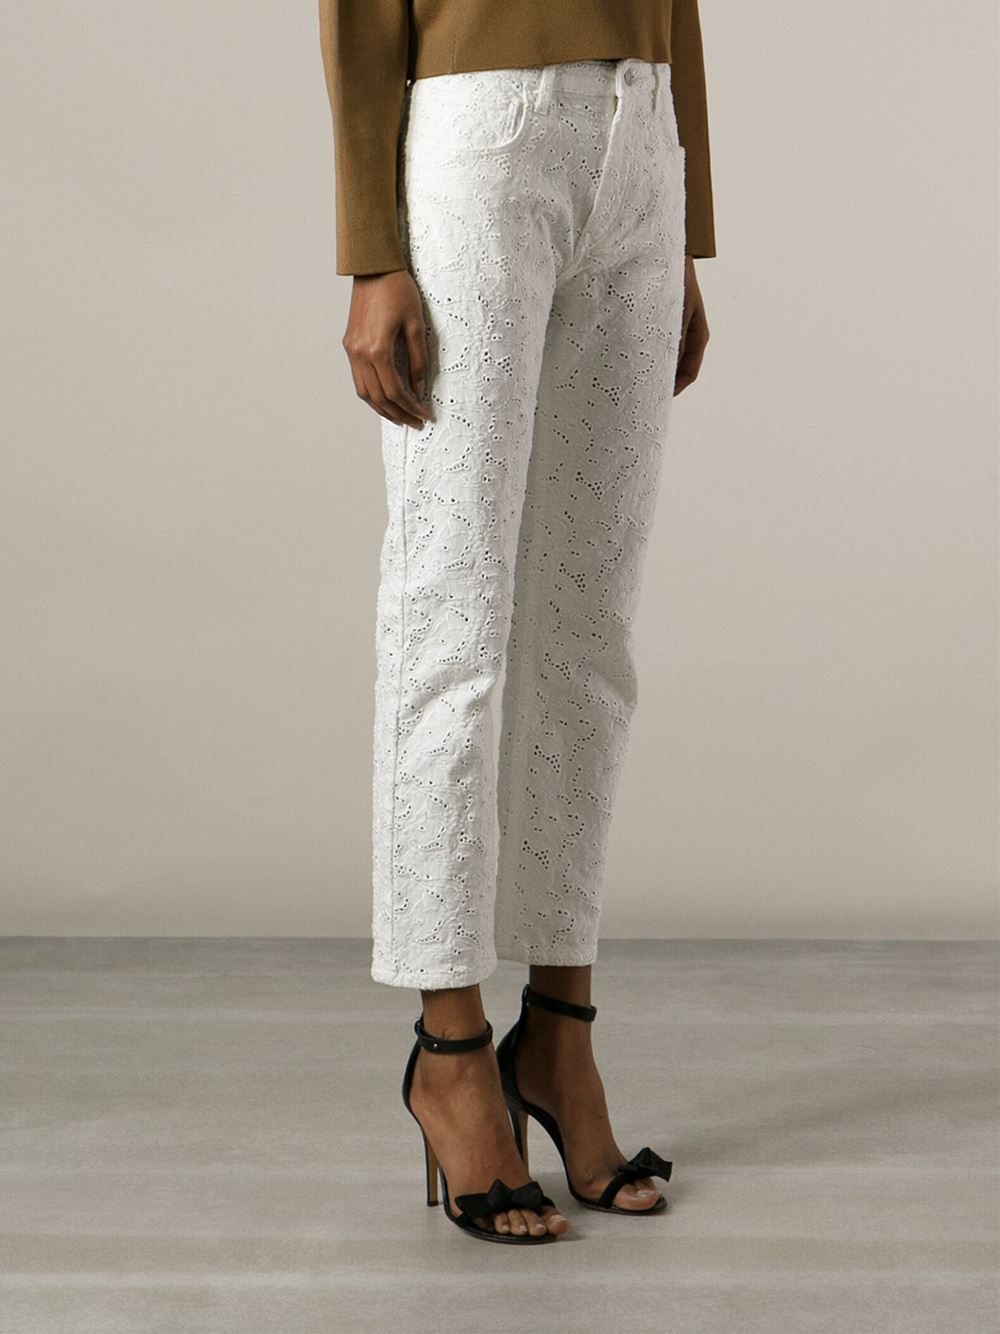 Isabel Marant Étoile Embroidered Crochet Trousers - Fiacchini - Farfetch.com